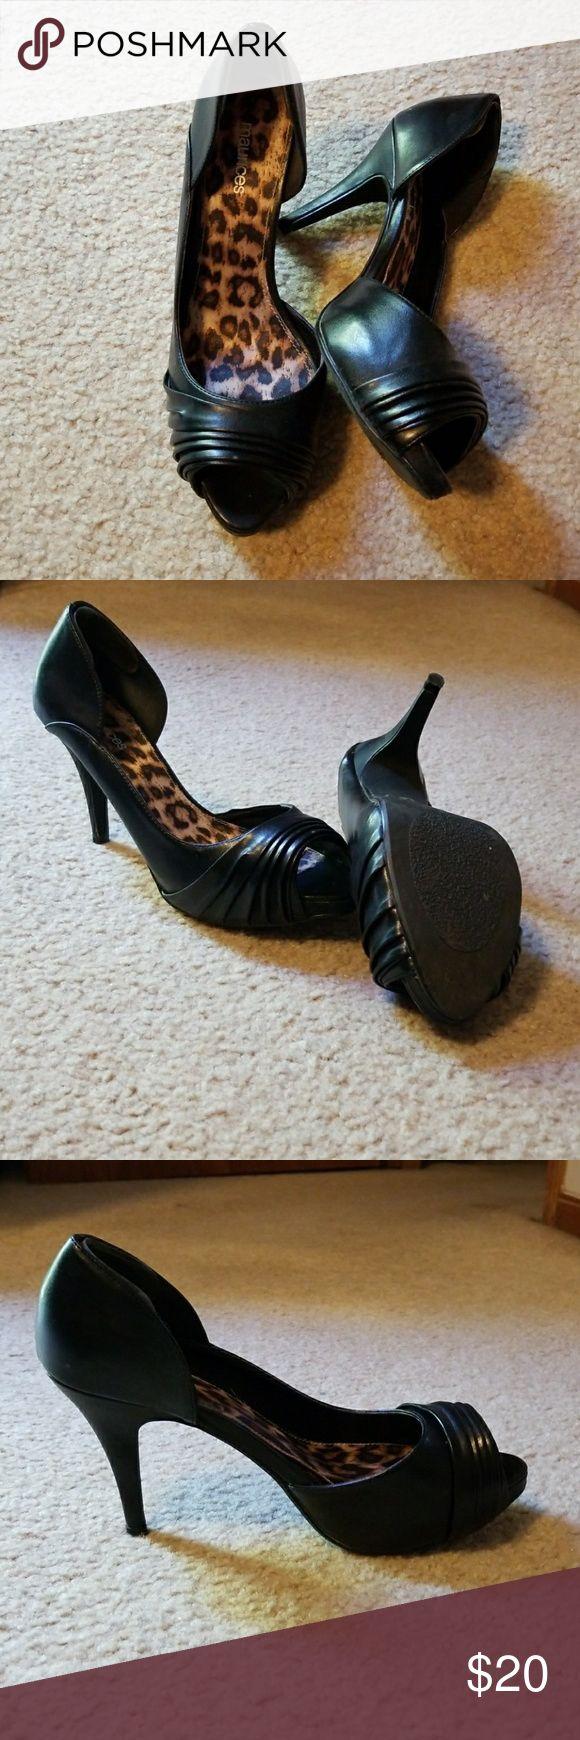 Selling this Black Peep toe heels on Poshmark! My username is: sarahanne0714. #shopmycloset #poshmark #fashion #shopping #style #forsale #Maurices #Shoes